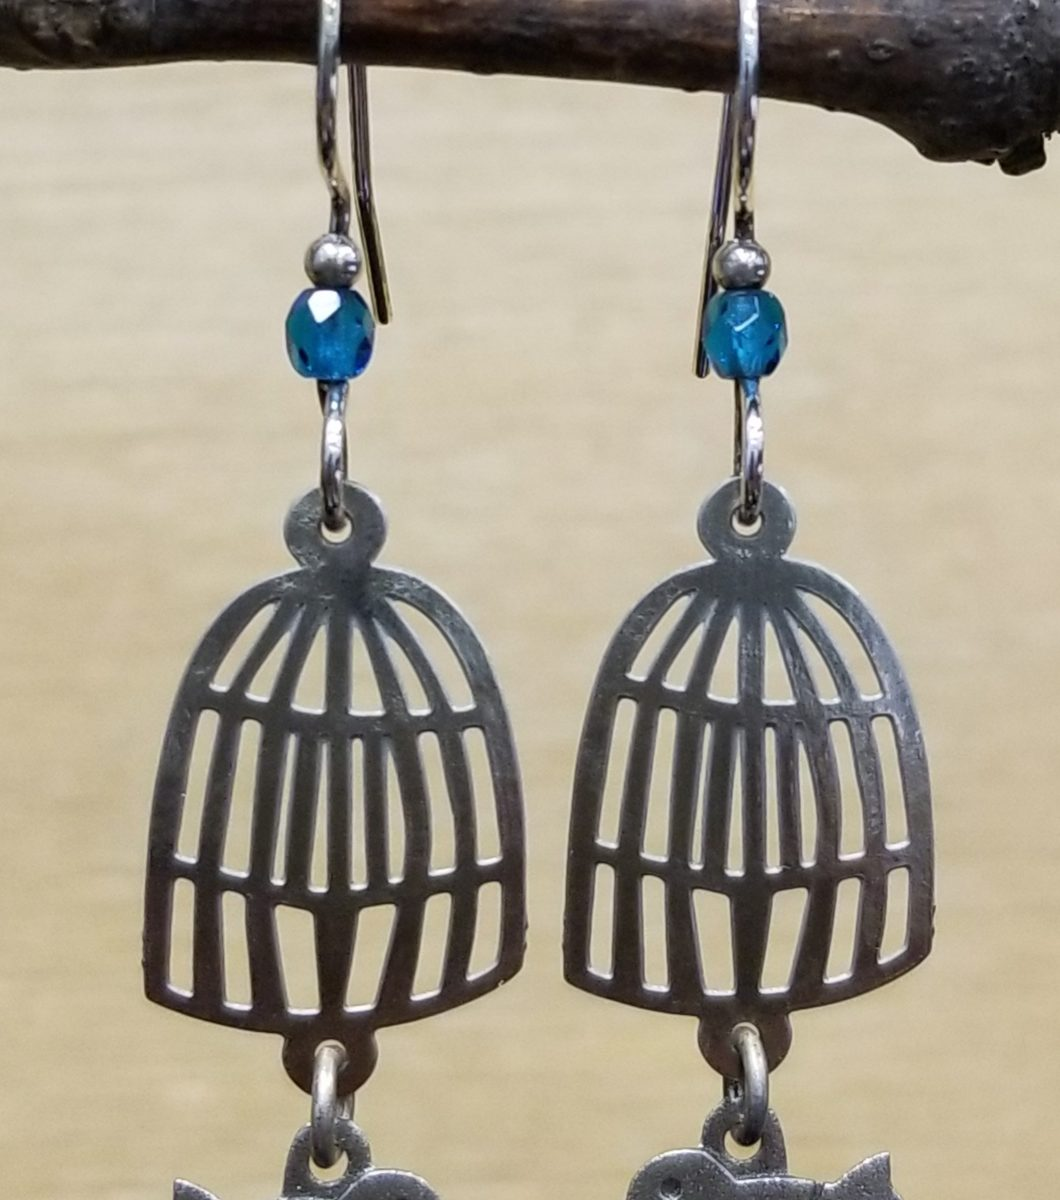 bird and birdcage earrings by Joseph Brinton